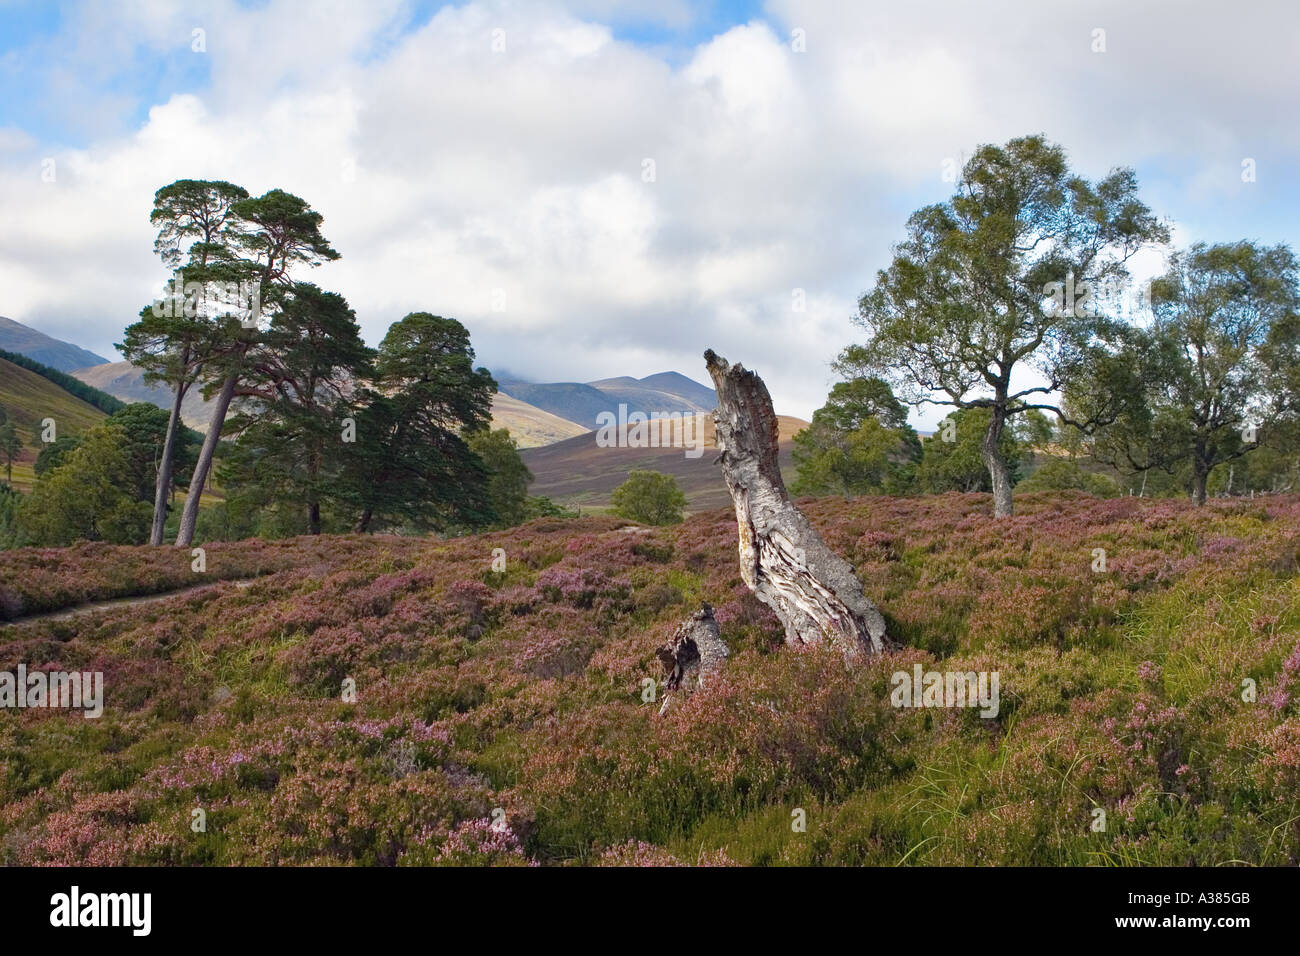 Heather in flower scotland - scottish heather moors and Caledonian Pine trees Mar Lodge Estate, Scotland uk - Stock Image